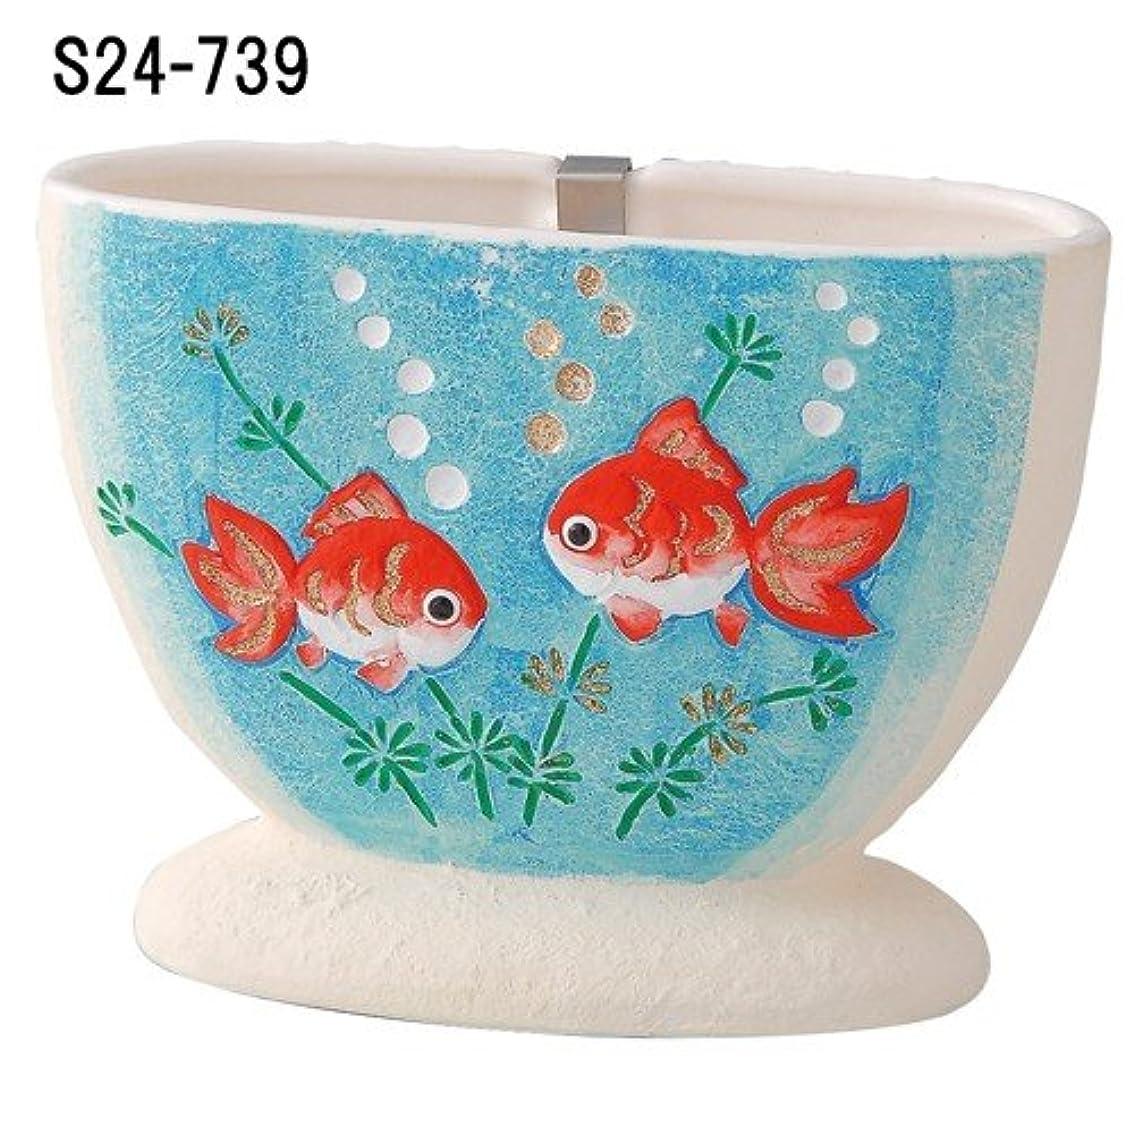 蚊遣器 手作り風 金魚 s24-739